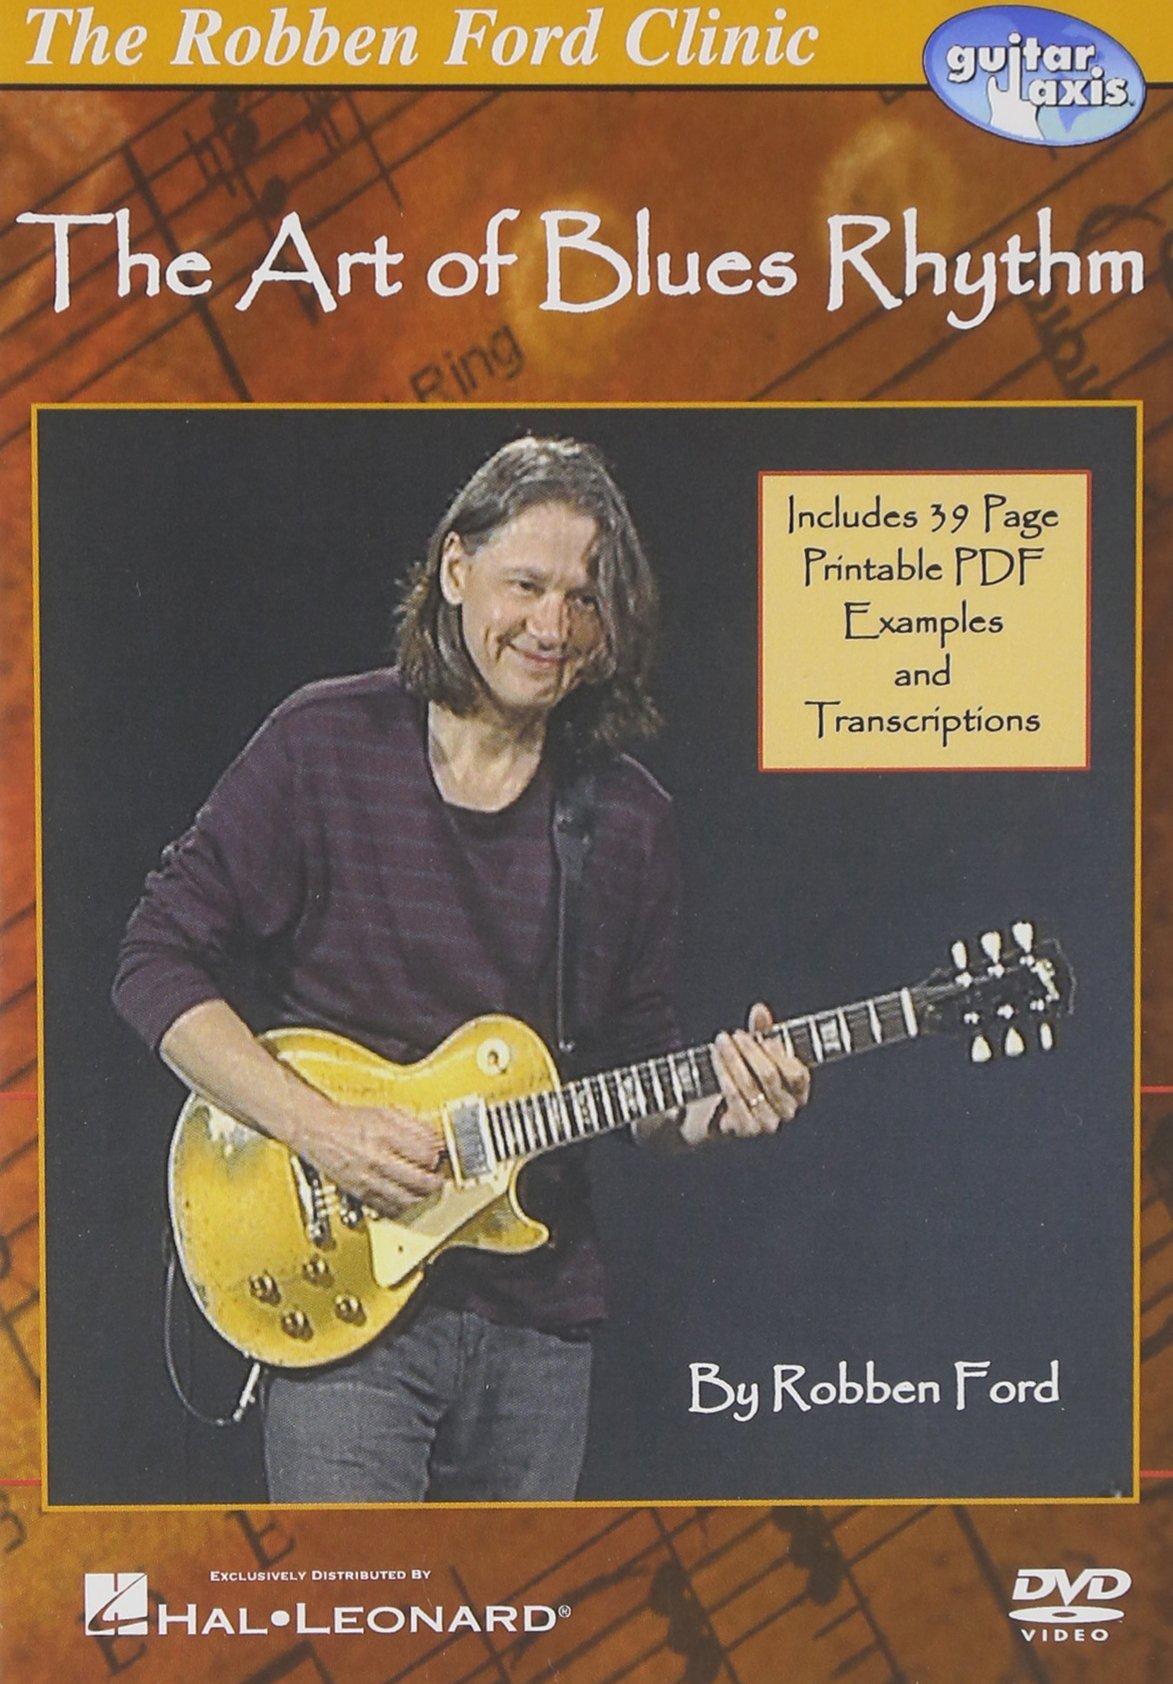 DVD : Robben Ford - The Art Of Blues Rhythm (DVD)